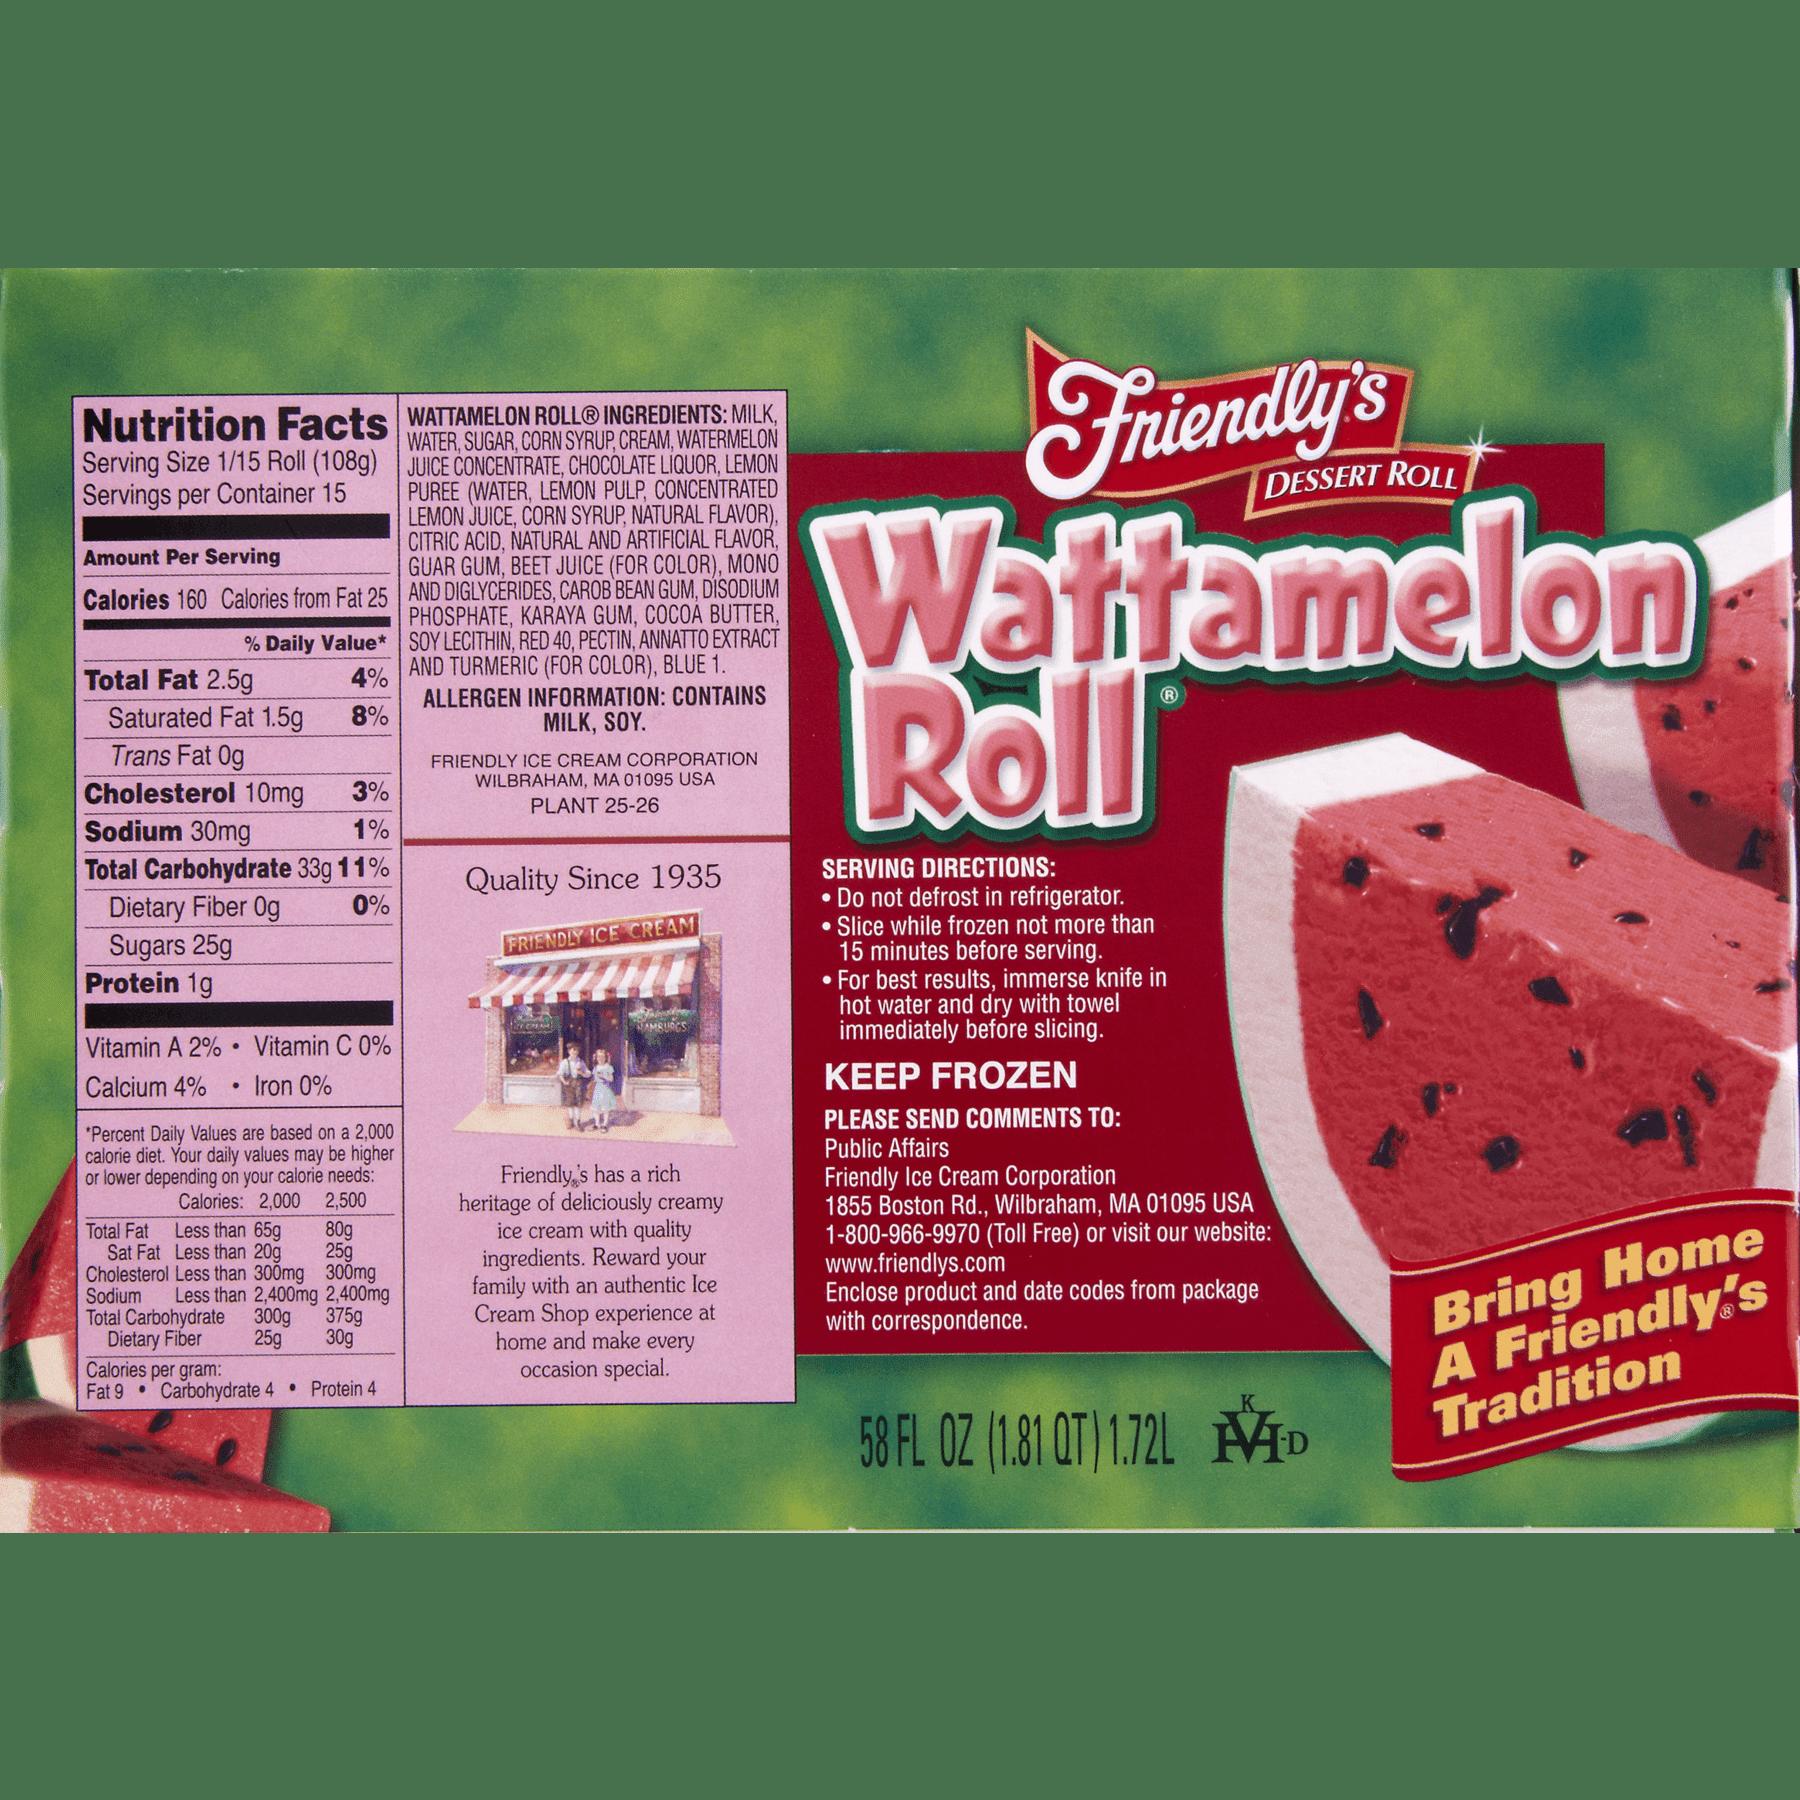 Friendlys watermelon roll sherbet roll 58 fl oz box walmart ccuart Image collections